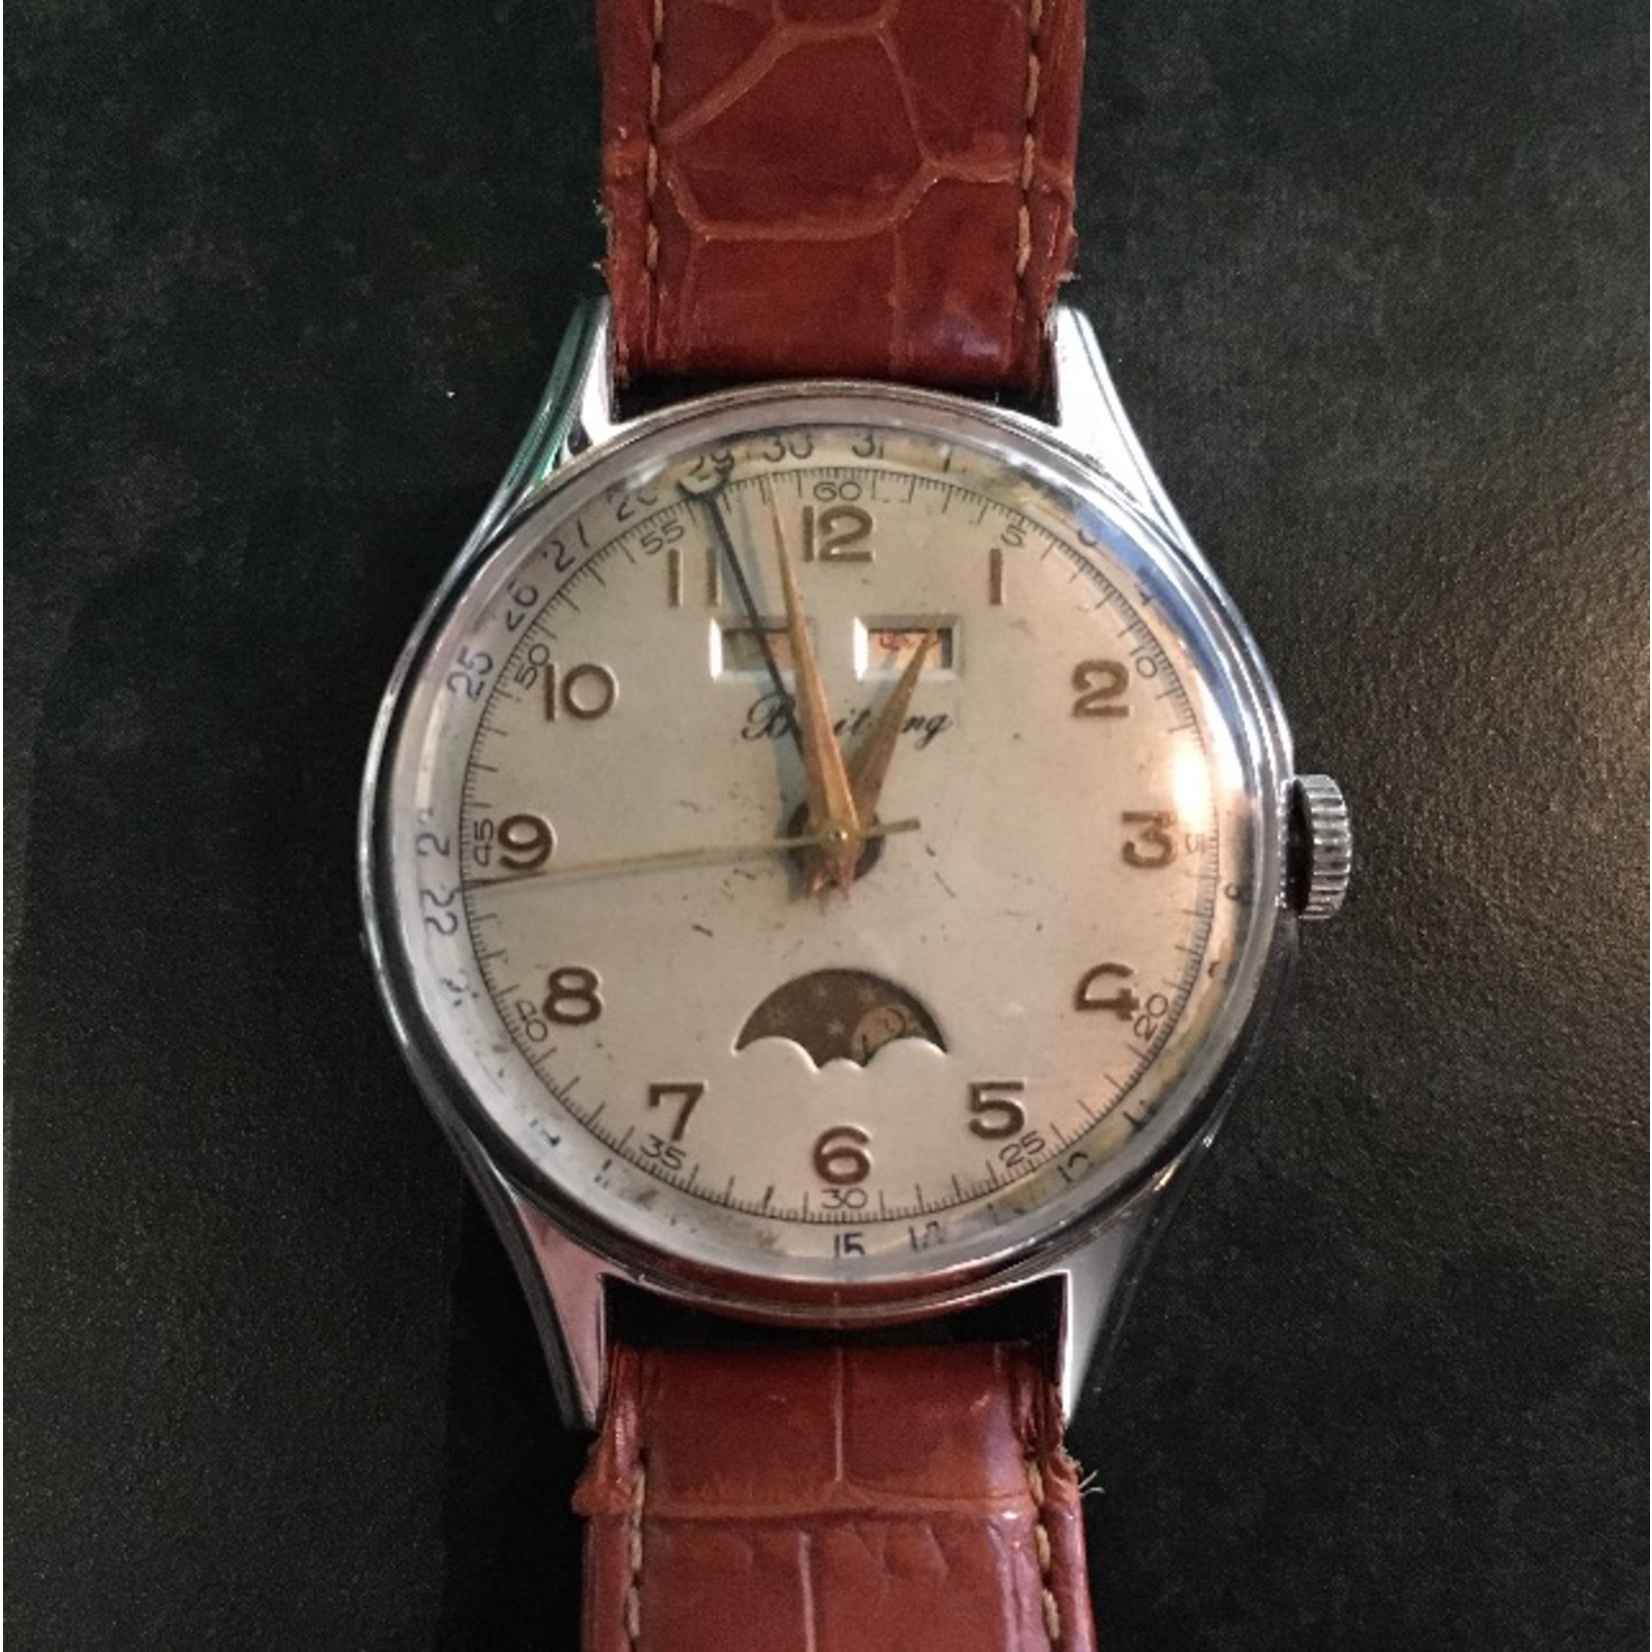 TAJHOME Vintage Watch Brieitling